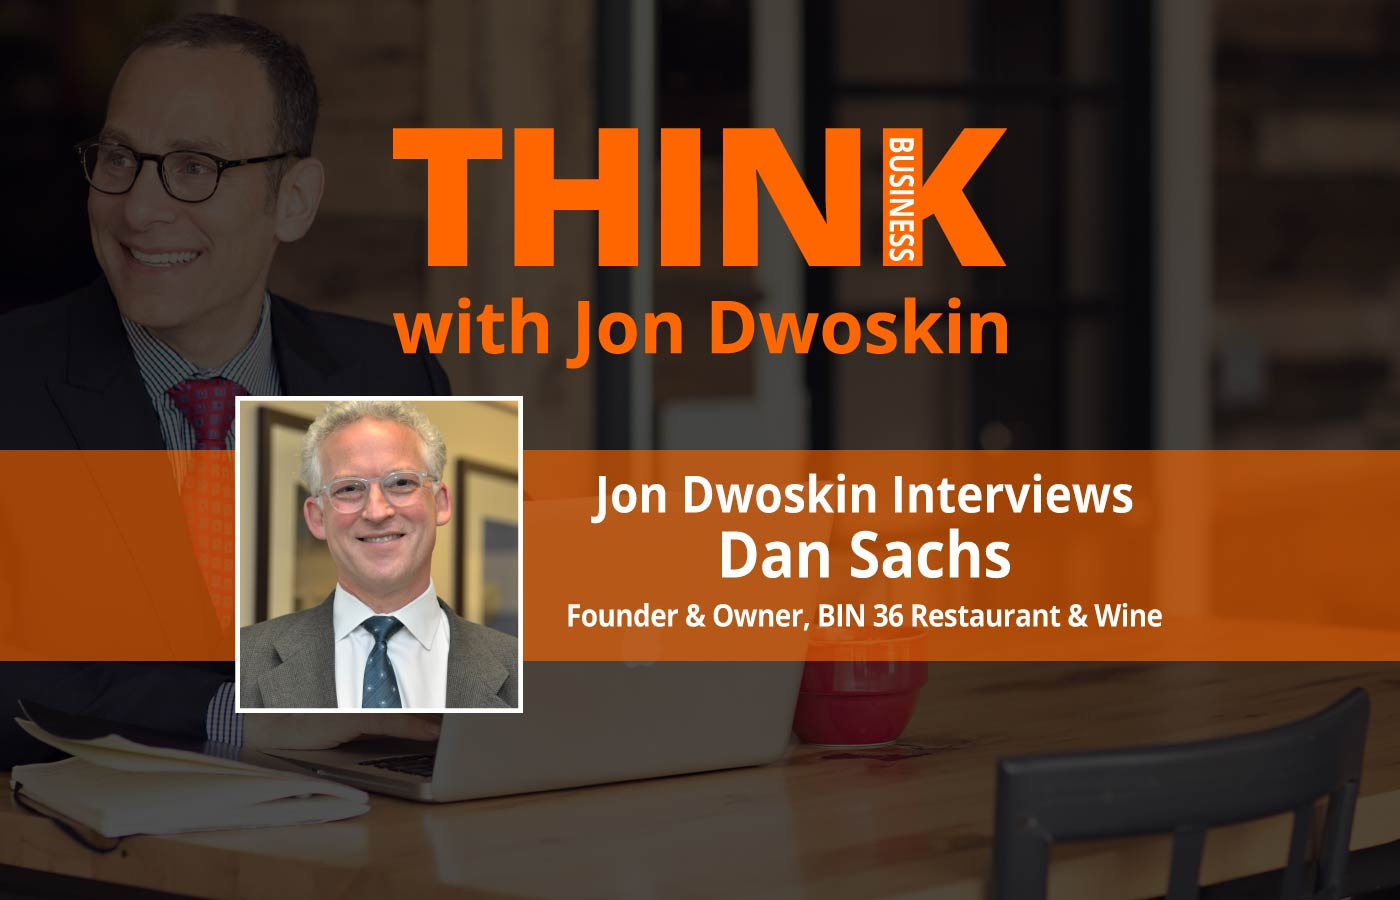 THINK Business Podcast - Jon Dwoskin Interviews Dan Sachs